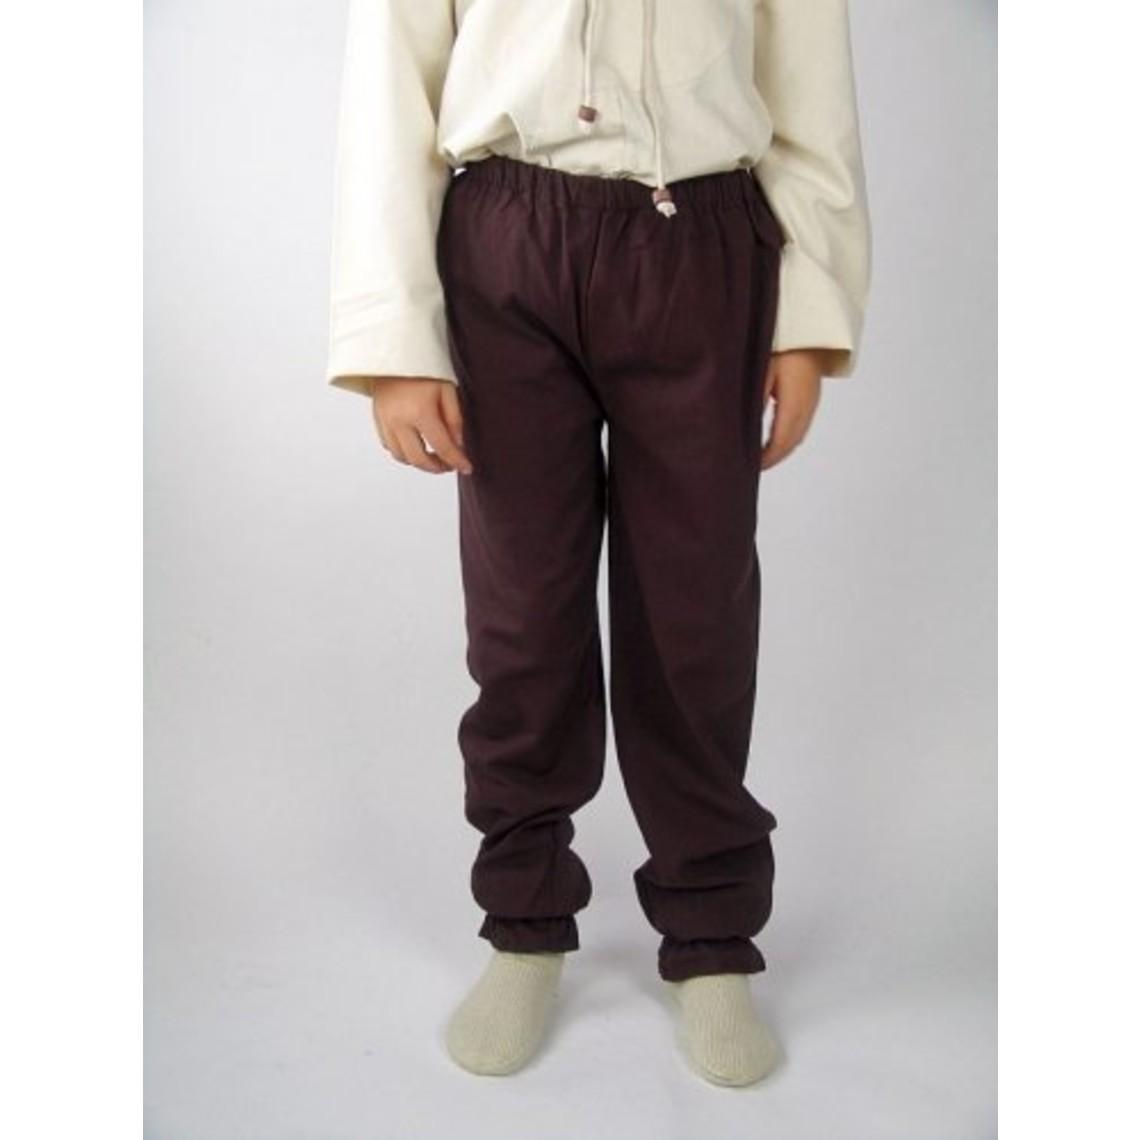 Leonardo Carbone Pantalones de niños históricos